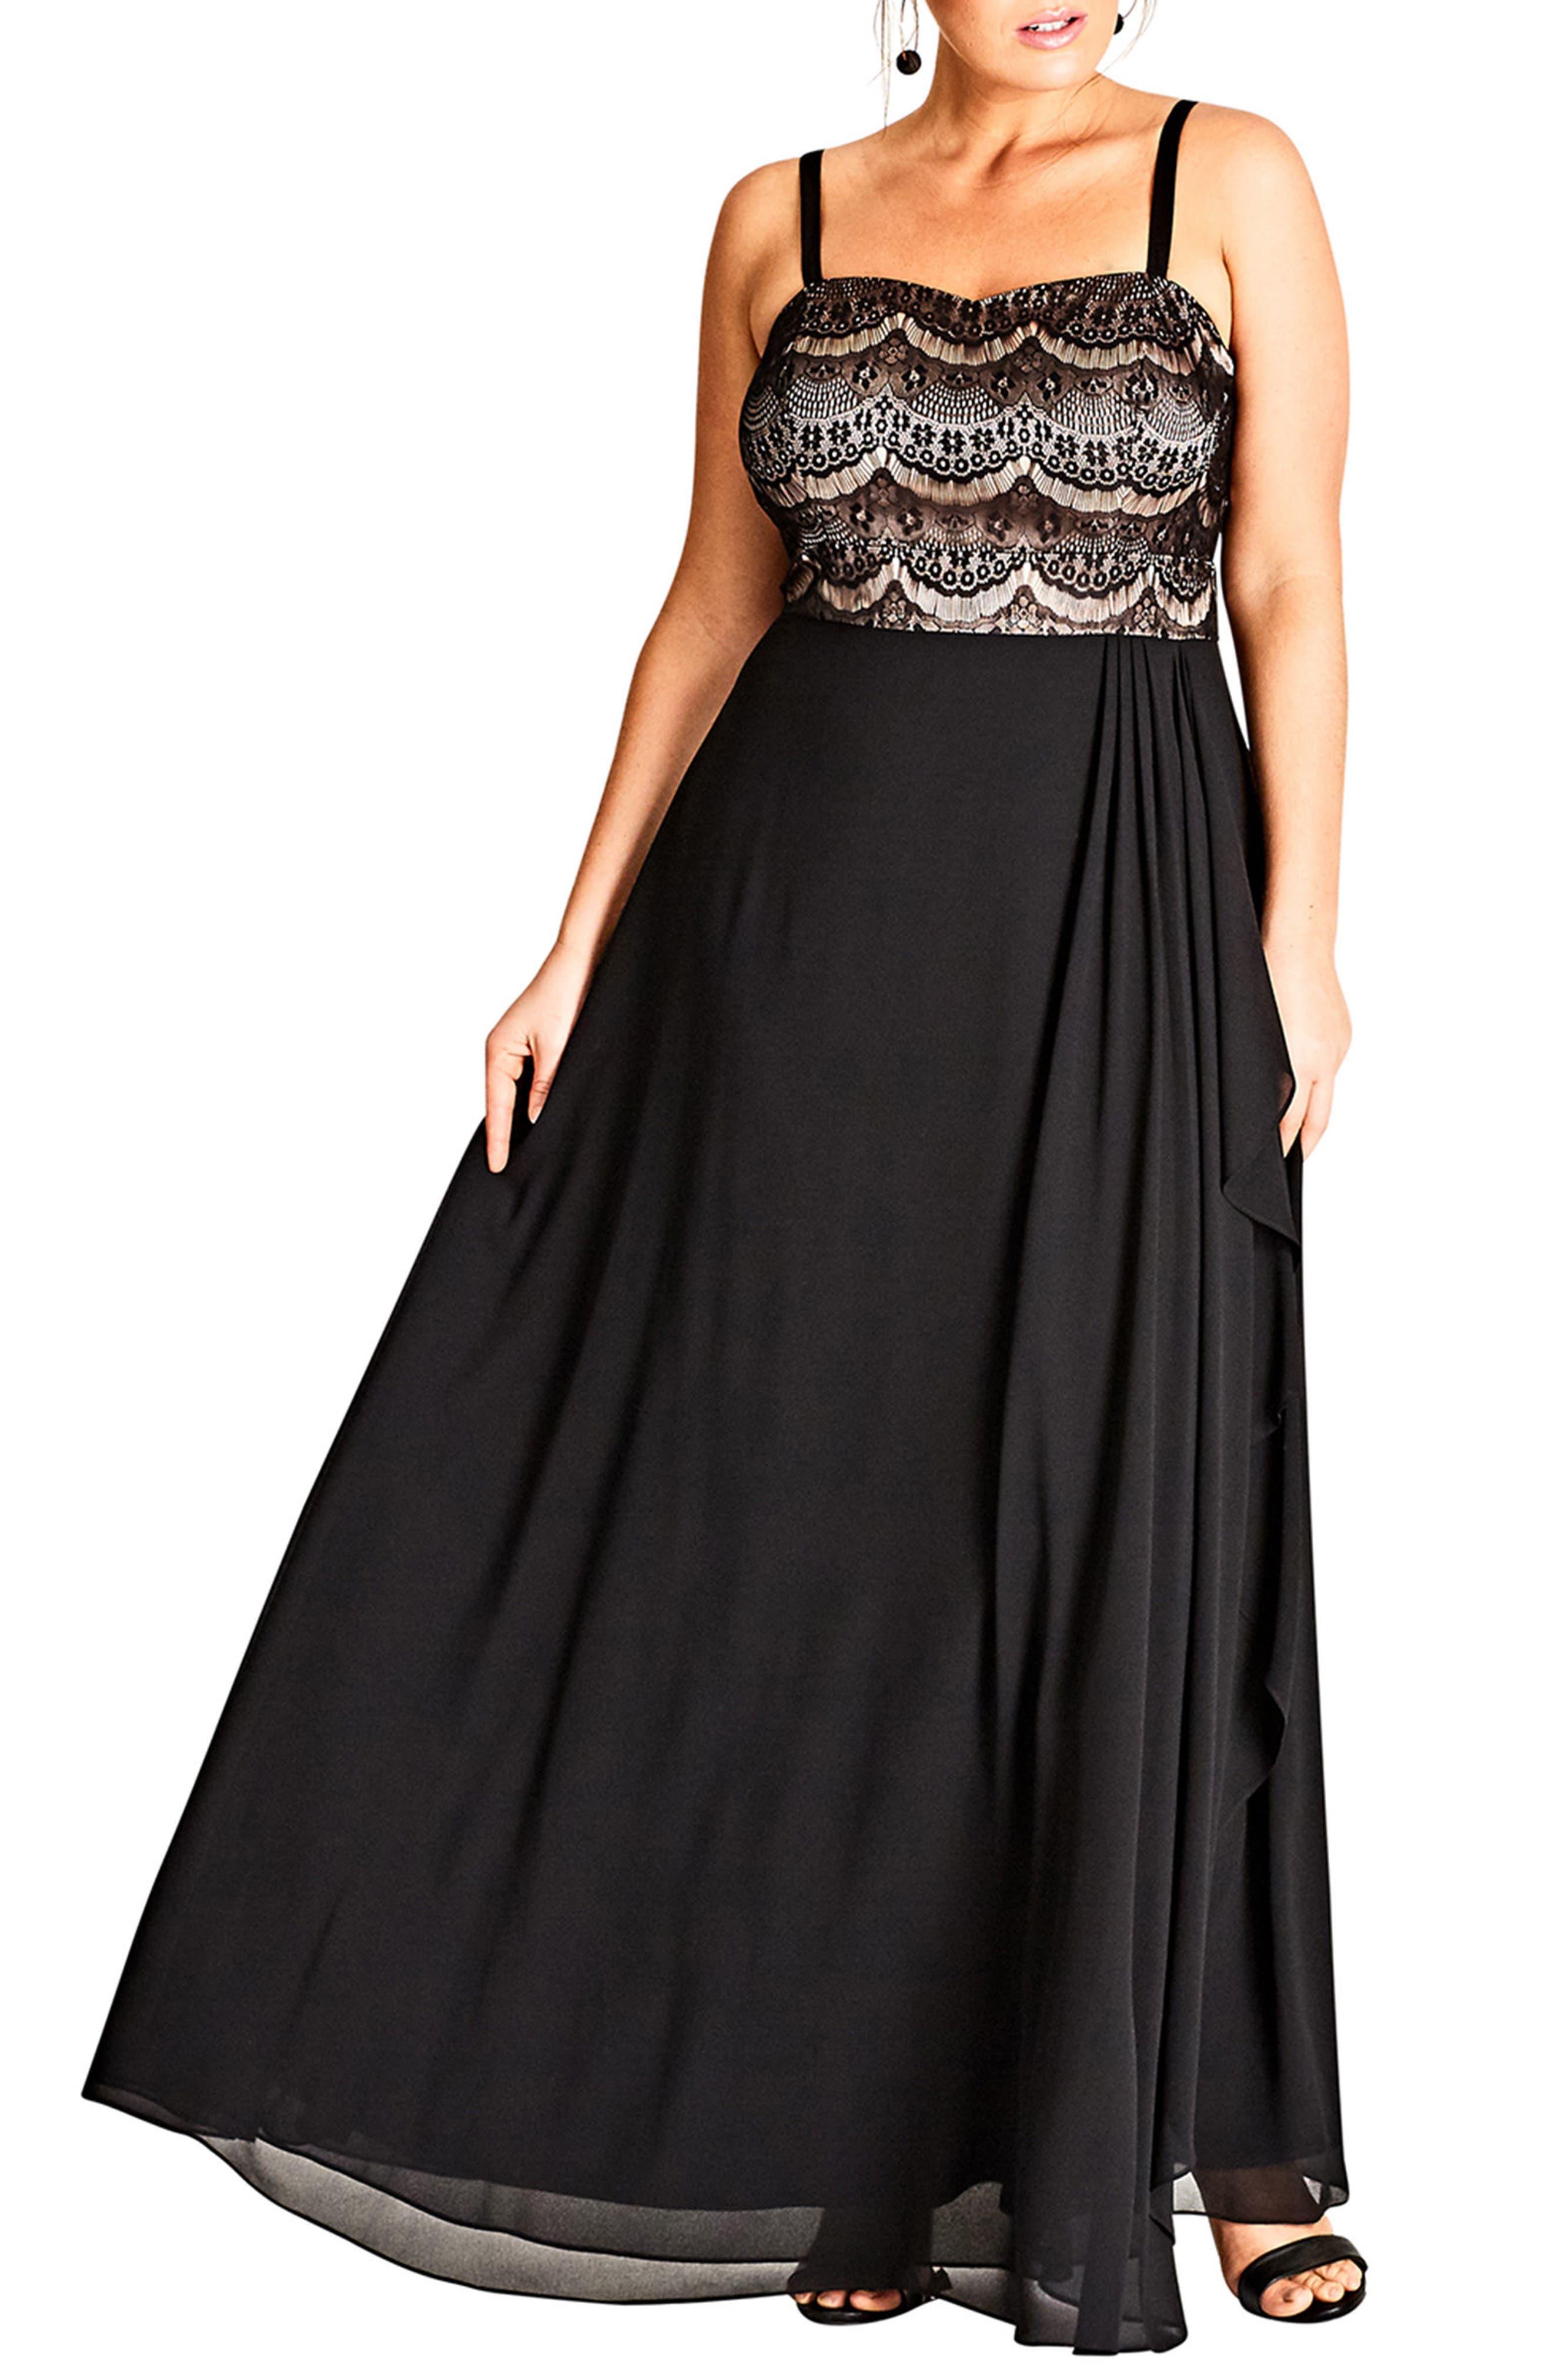 Plus Size City Chic Eyelash Ebony Lace & Chiffon Gown, Black